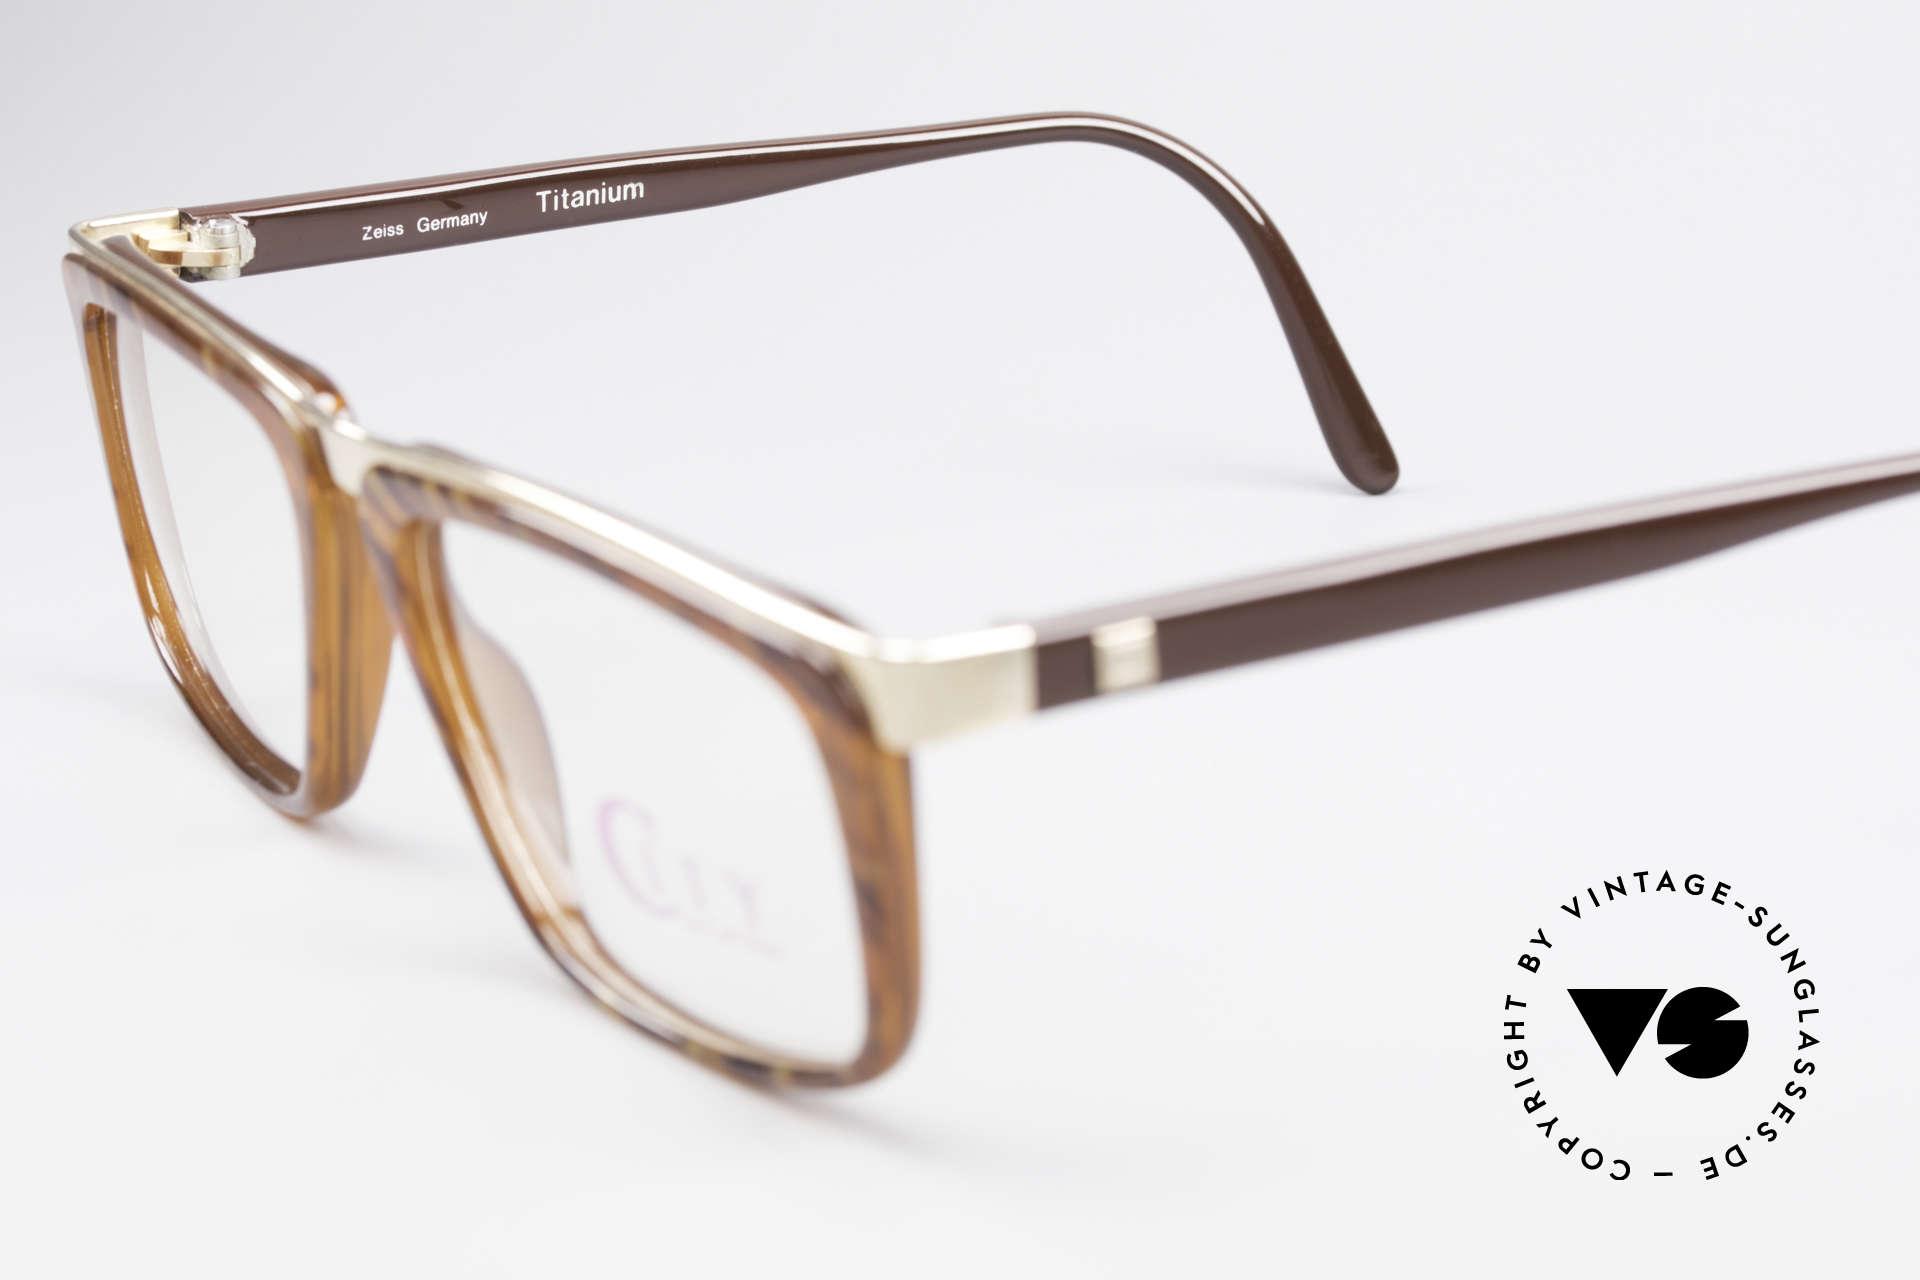 Zeiss 5967 90's Titanium Eyeglasses Men, unworn (like all our high-end Zeiss vintage eyeglasses), Made for Men